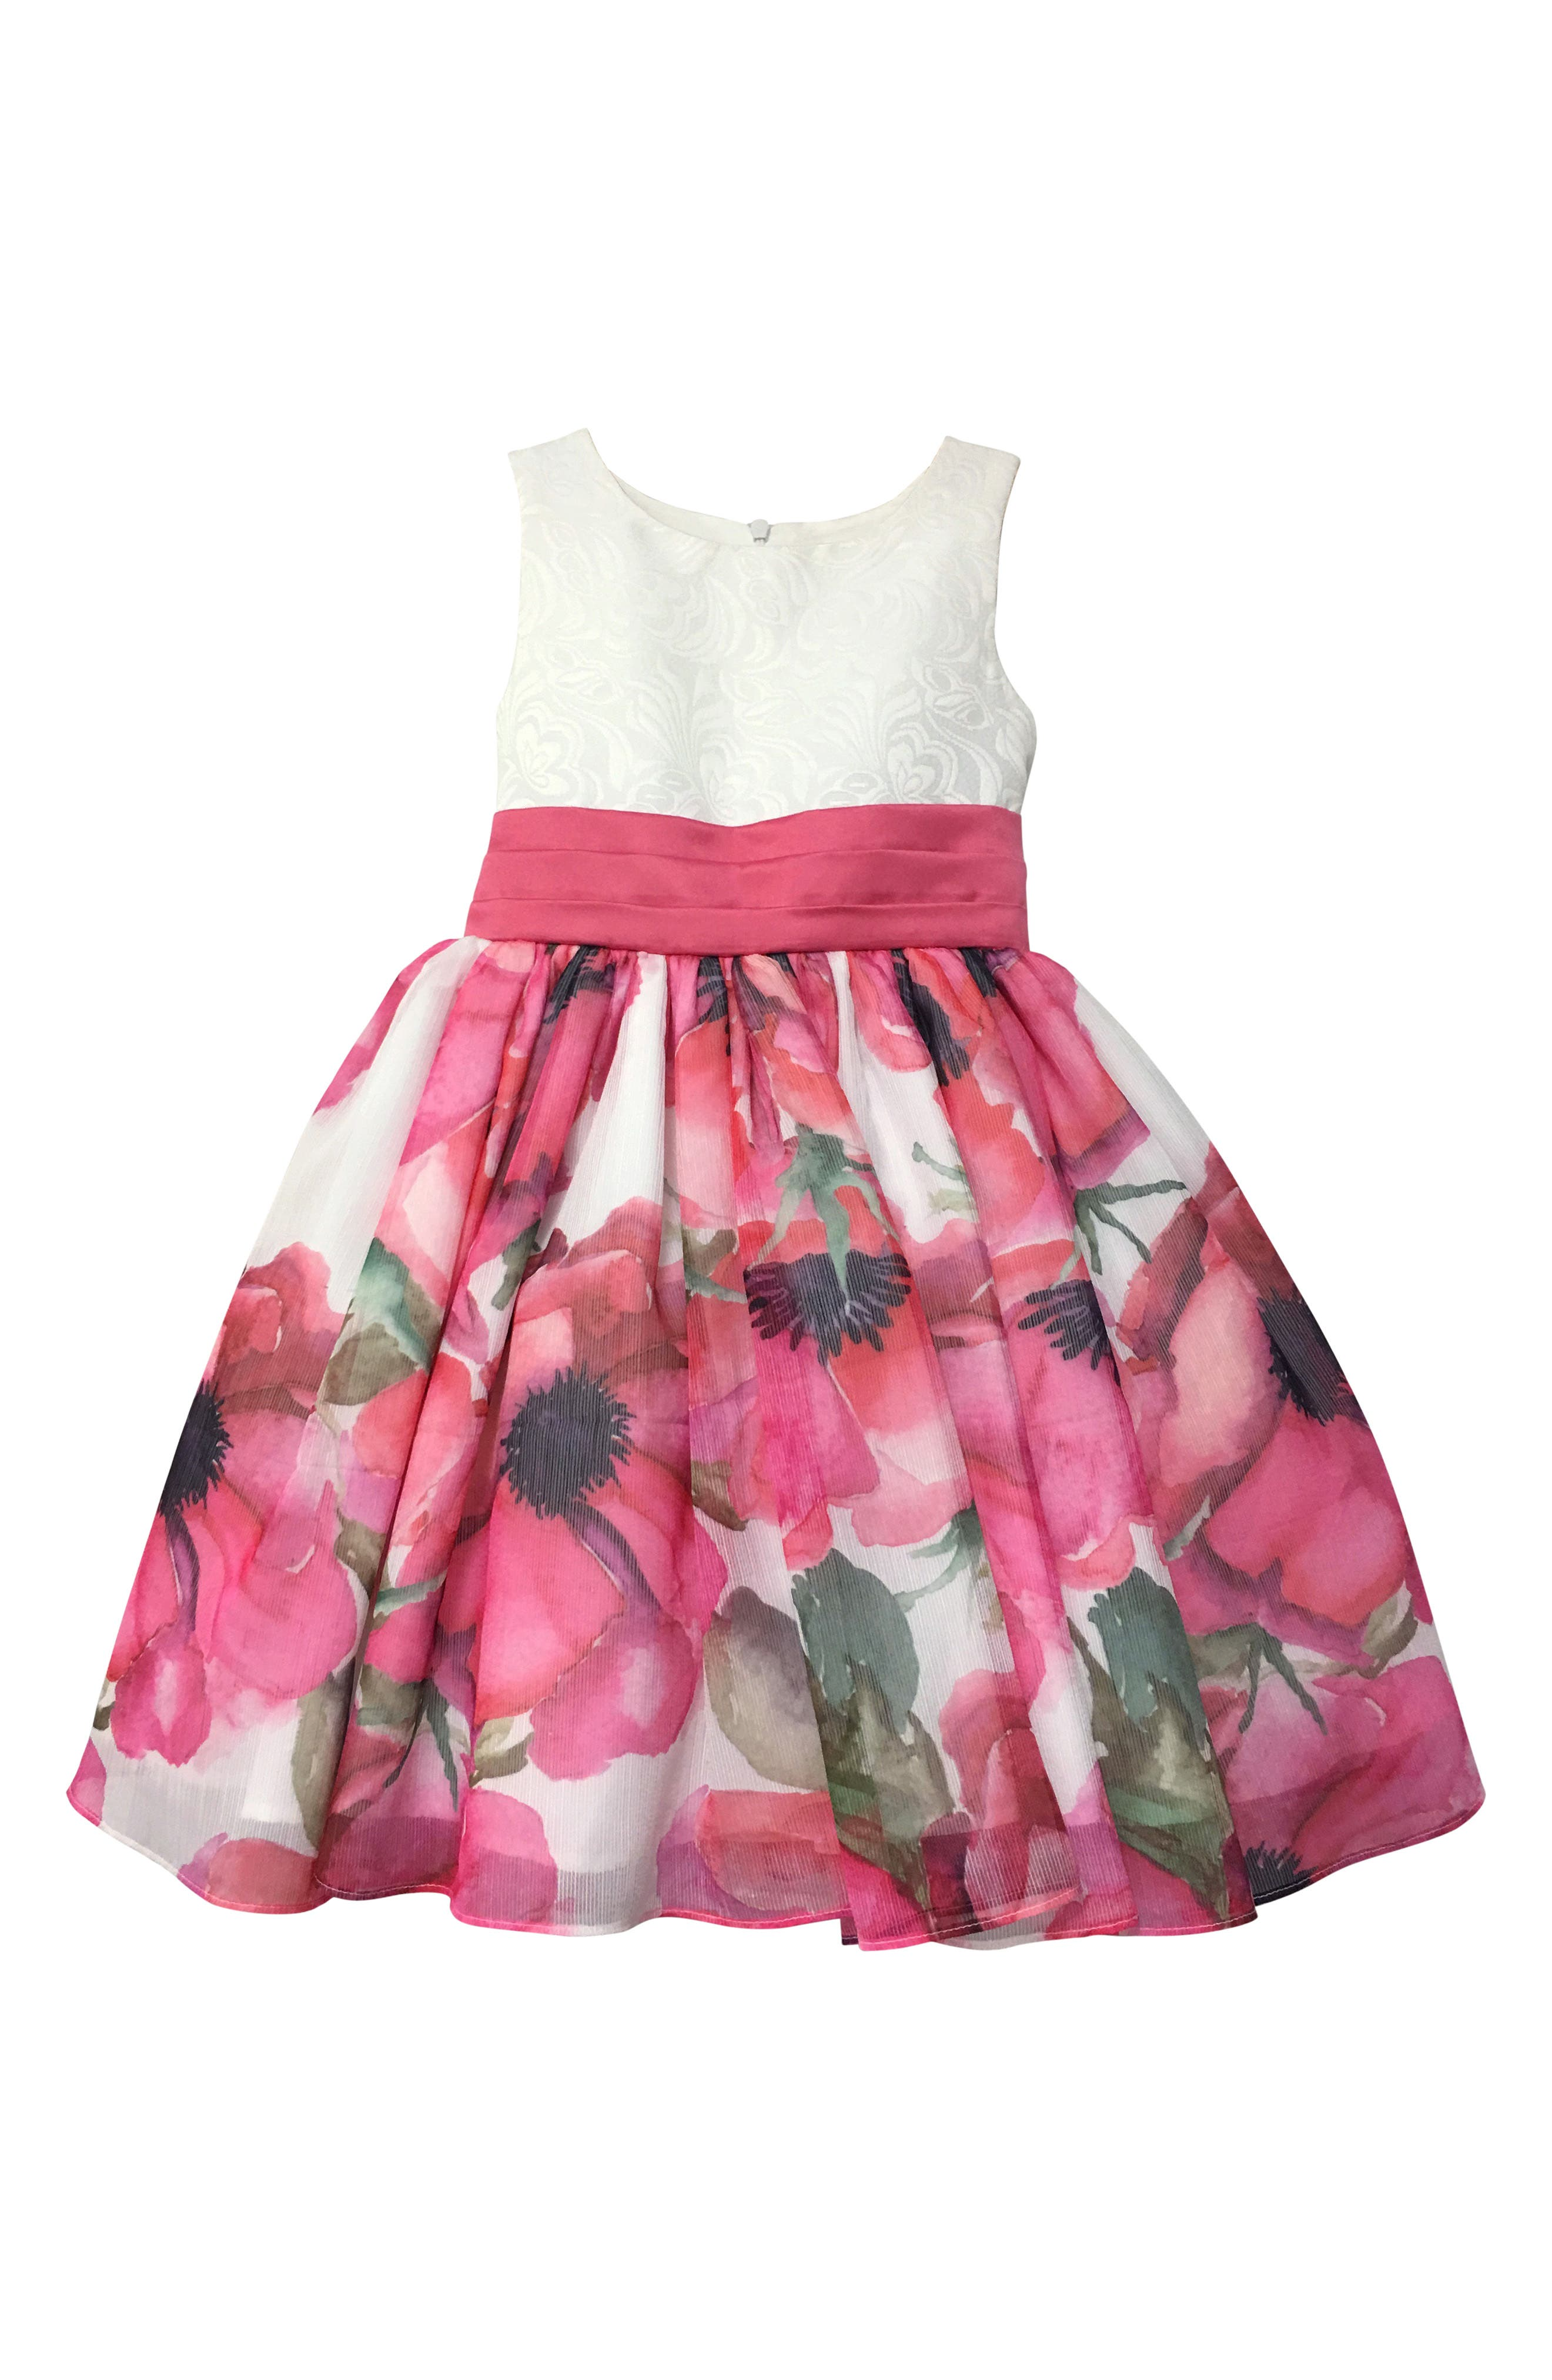 Resa Floral Party Dress,                             Main thumbnail 1, color,                             650